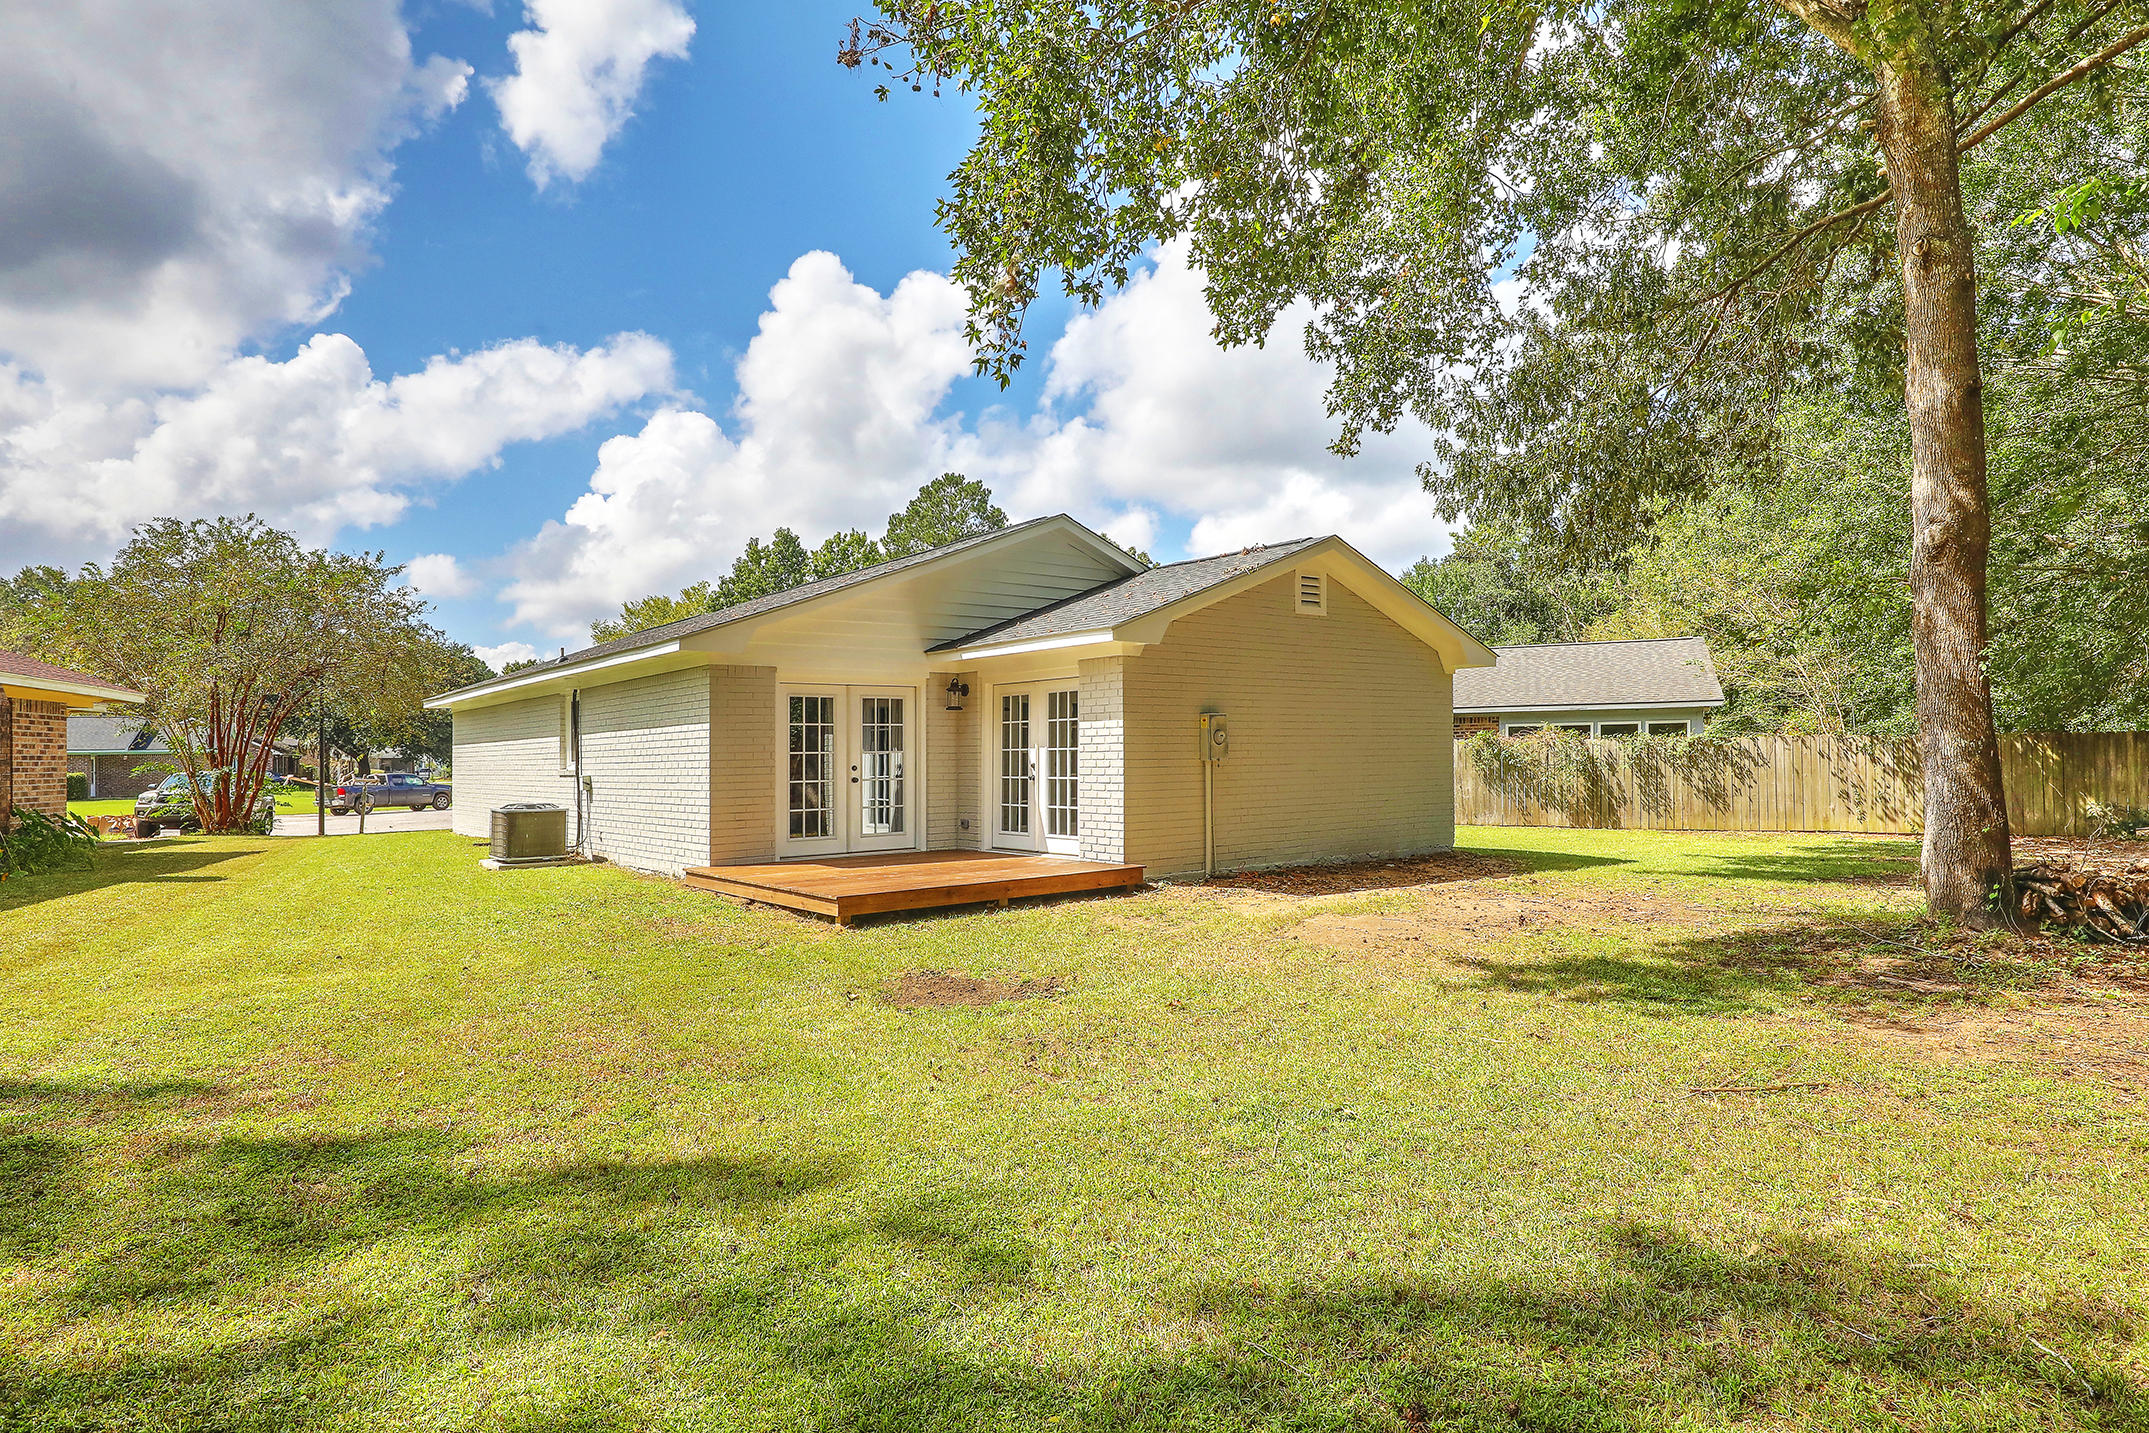 Bruno Acres Homes For Sale - 1674 Durkee, Charleston, SC - 11